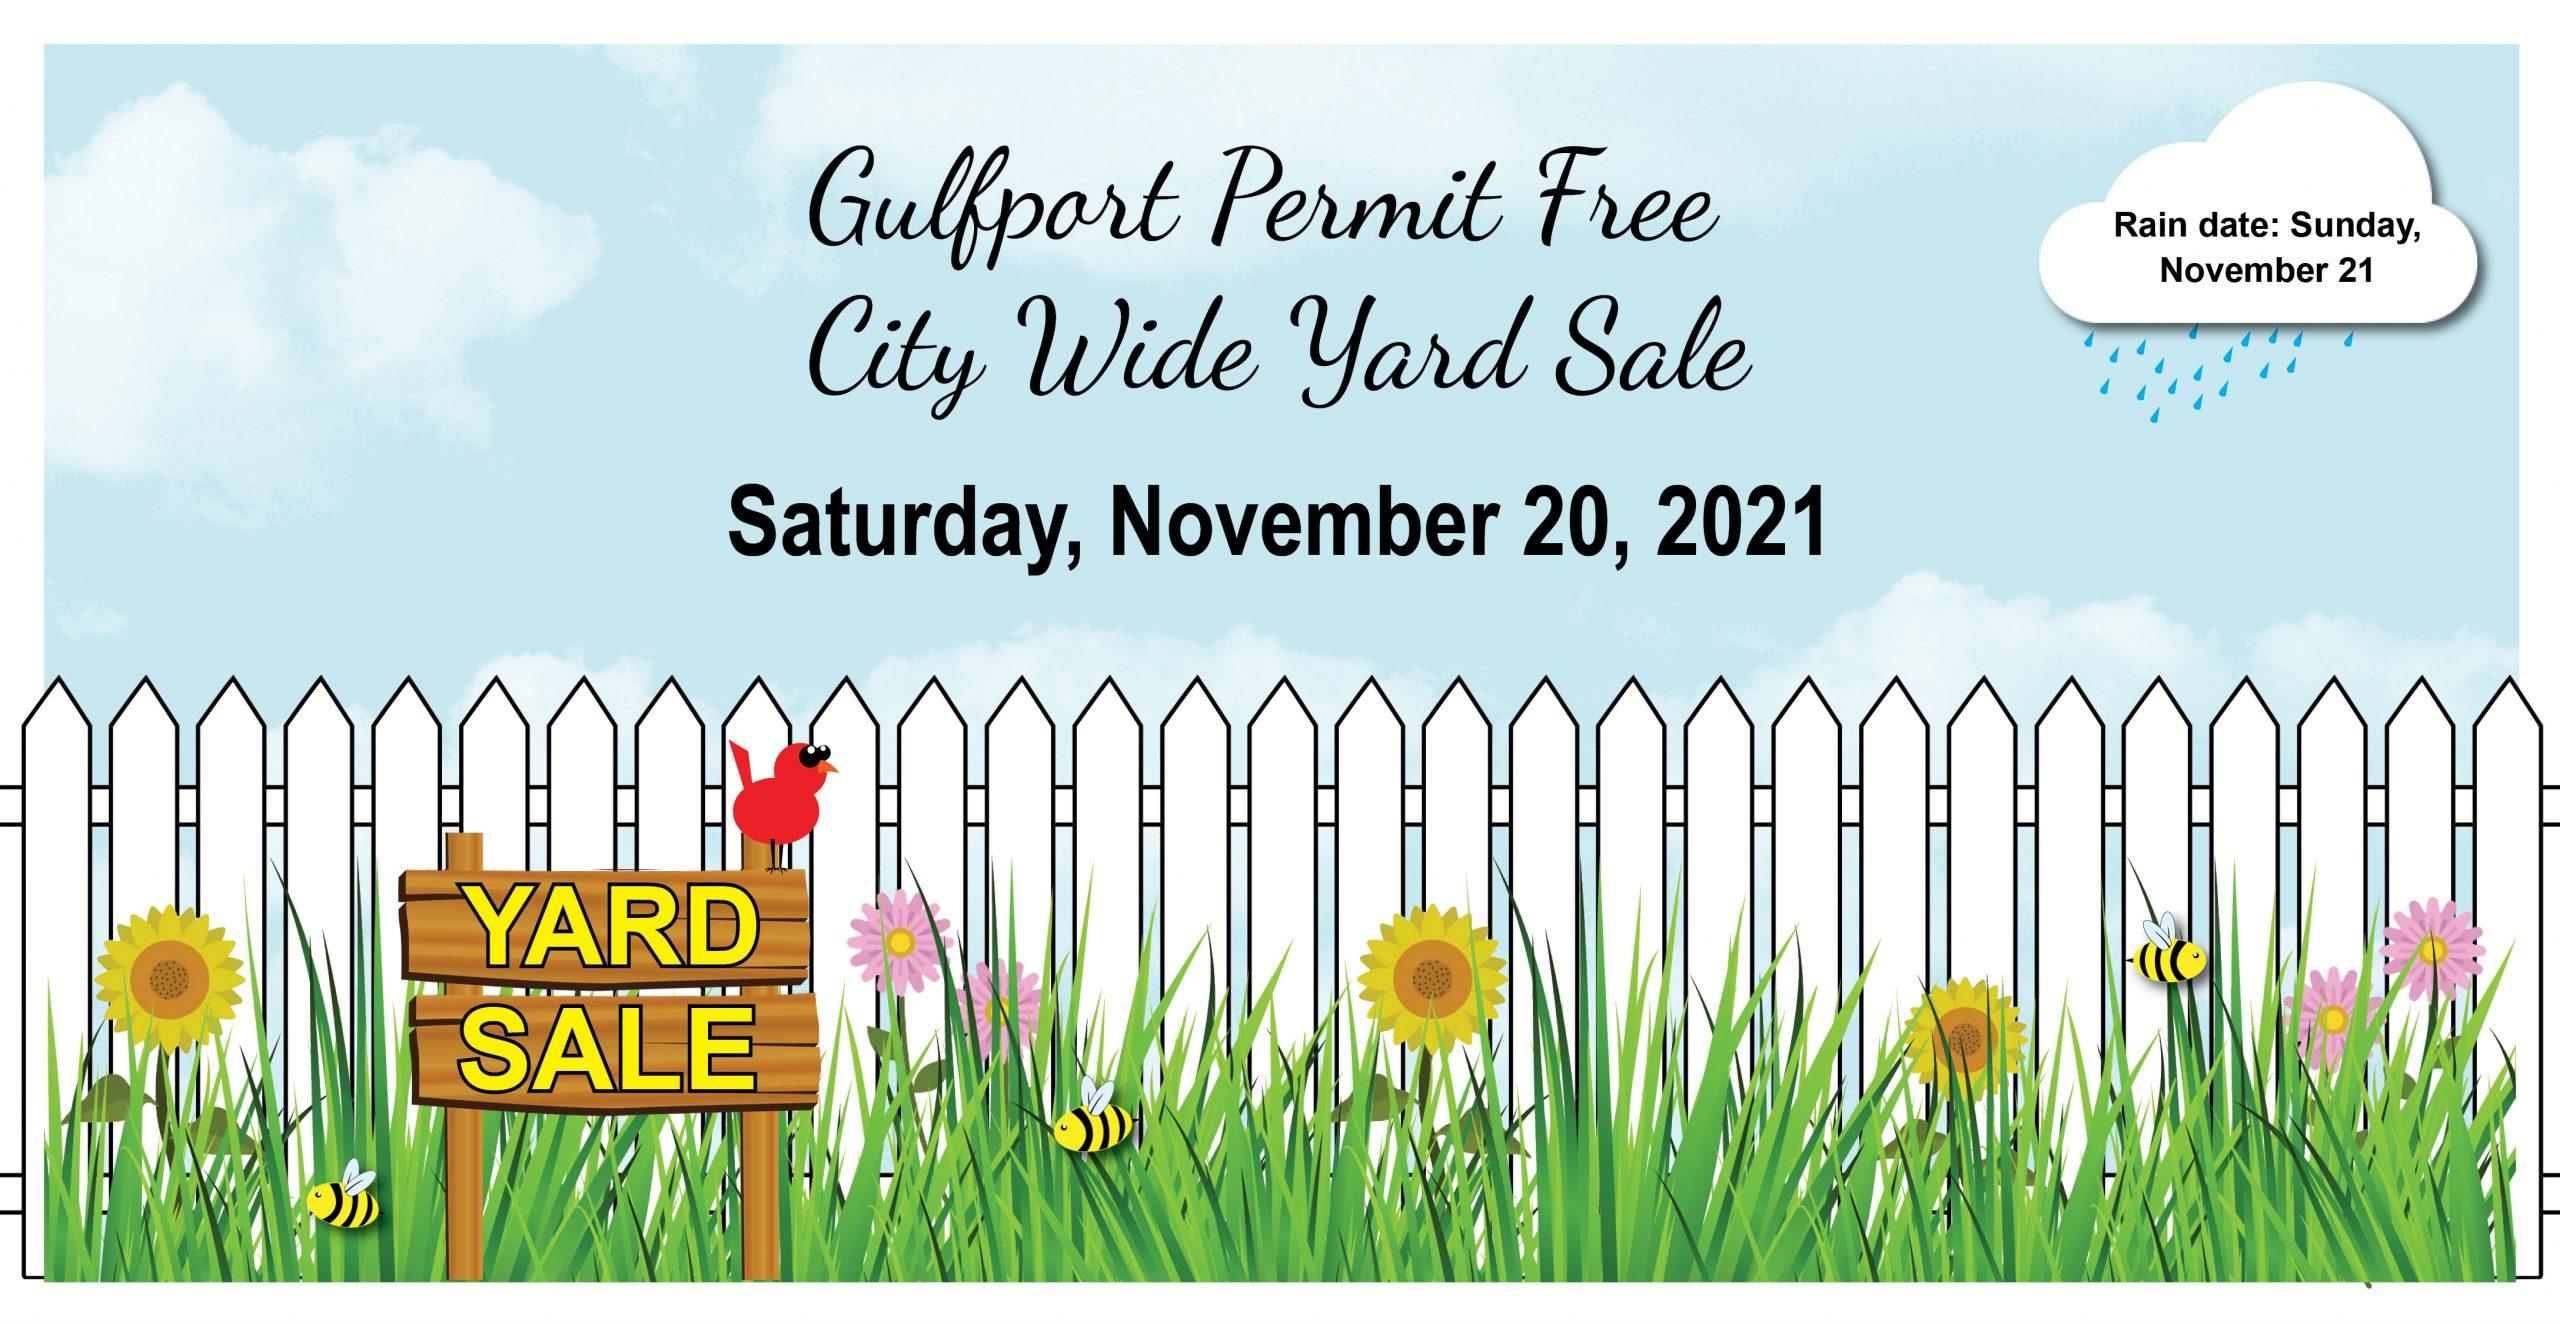 Gulfport Permit Free City Wide Yard Sale